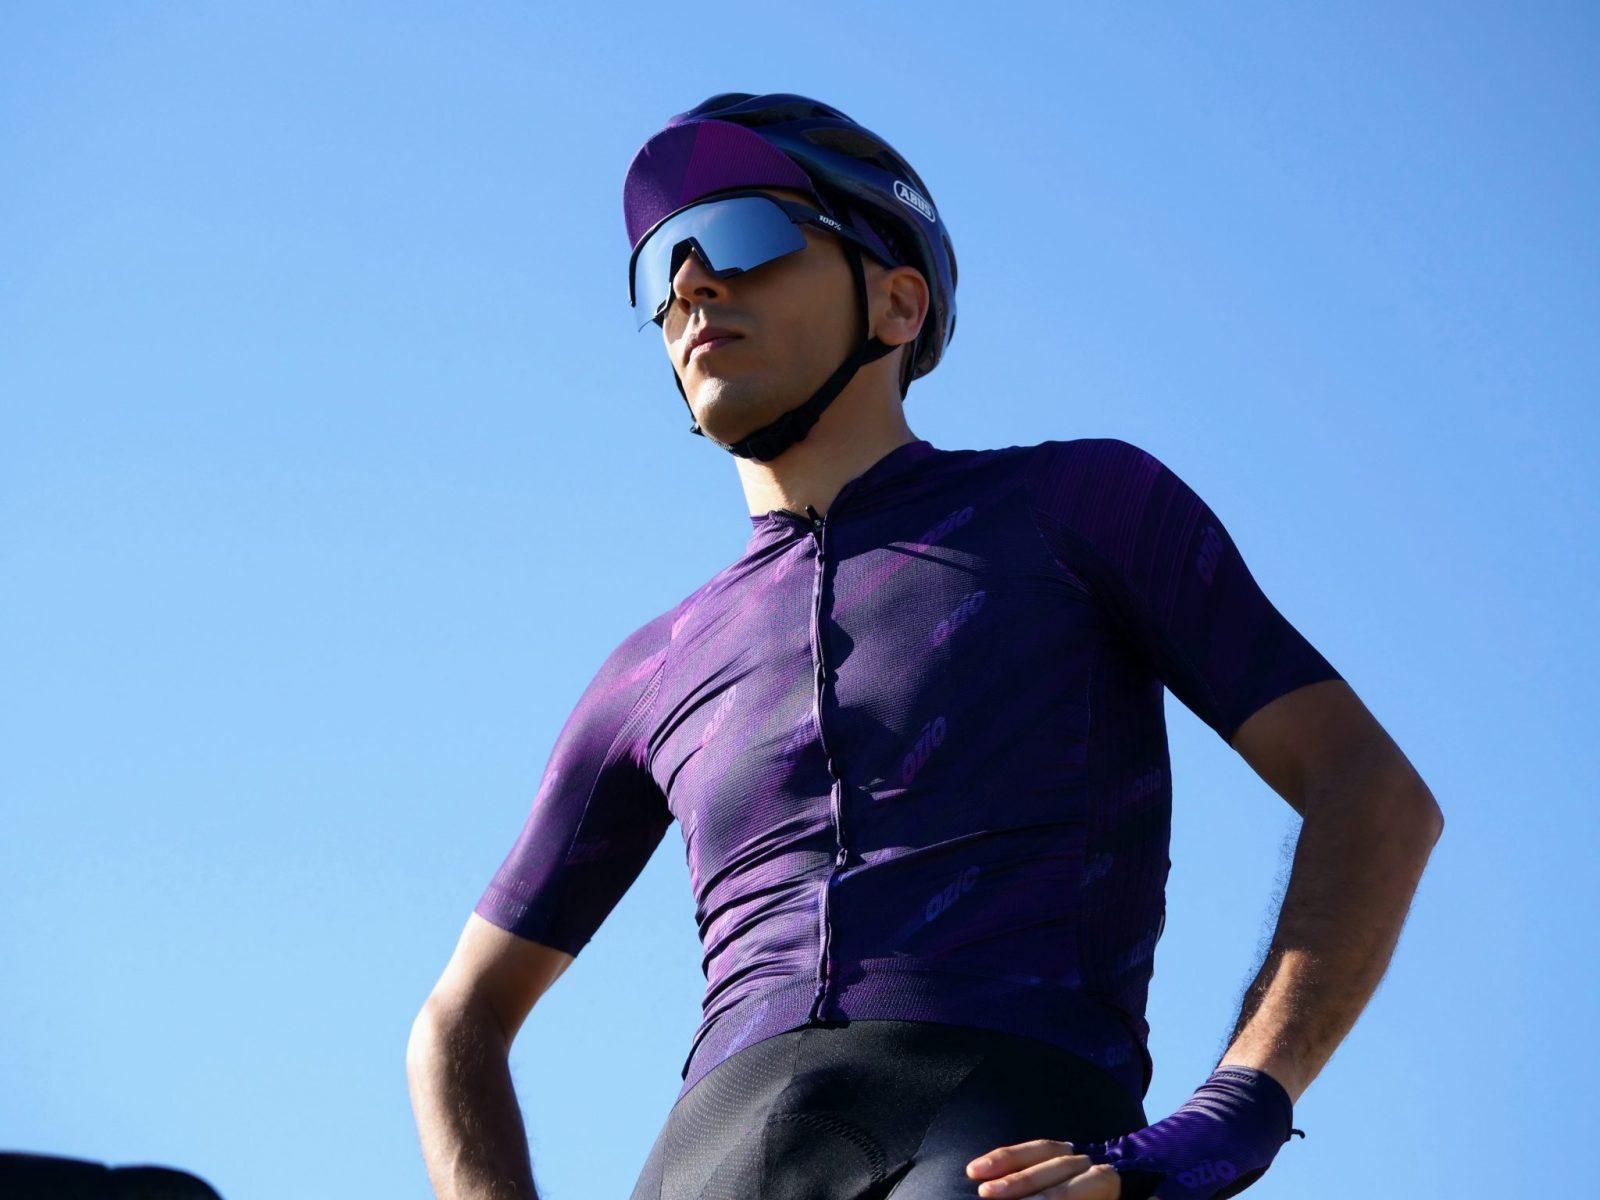 maillot de cycliste ciel bleu